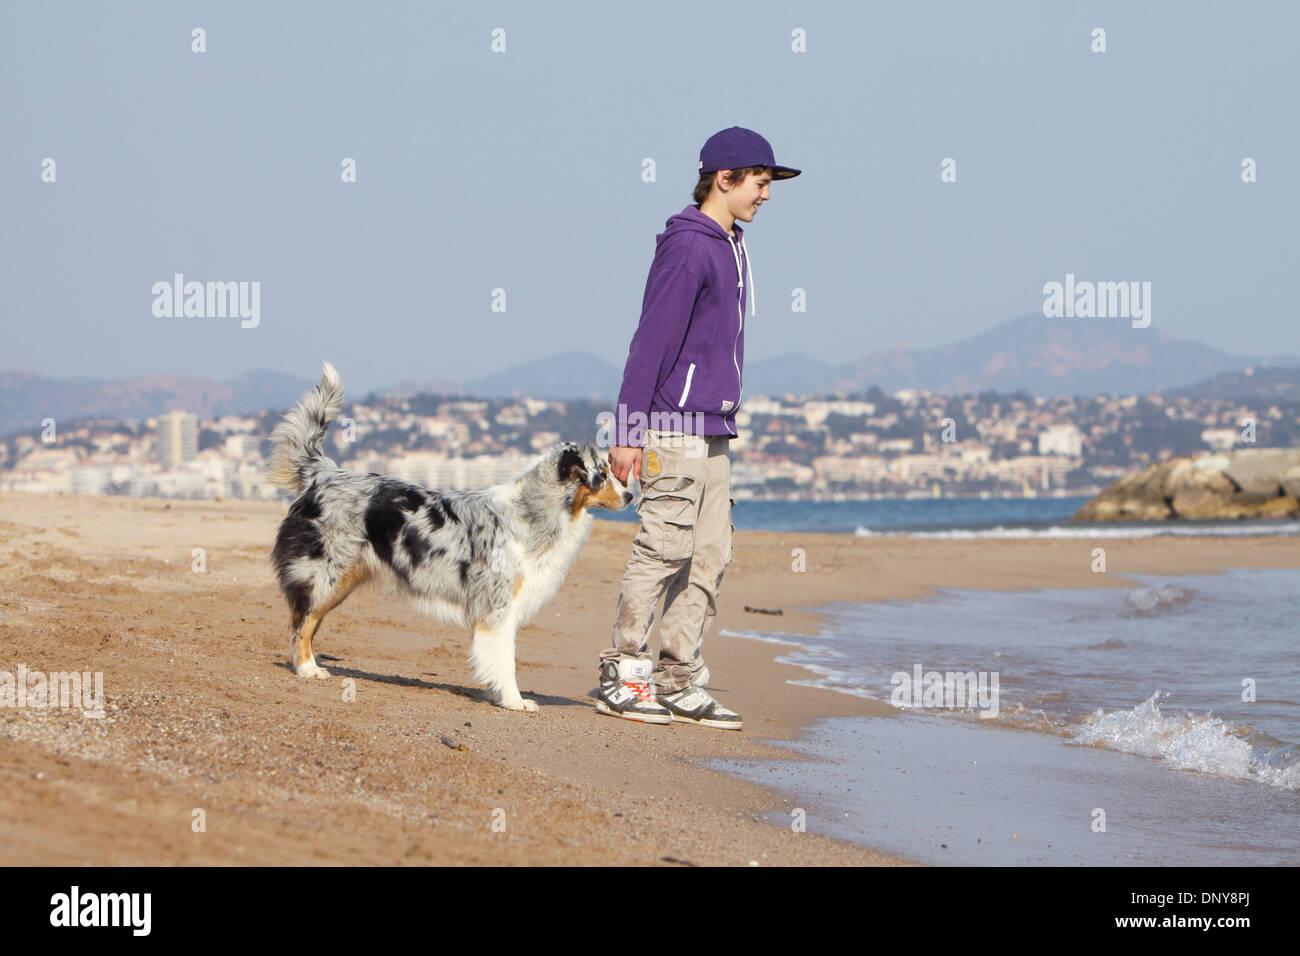 Dog Australian shepherd / Aussie  adult (blue merle) walking with a boy on the beach - Stock Image